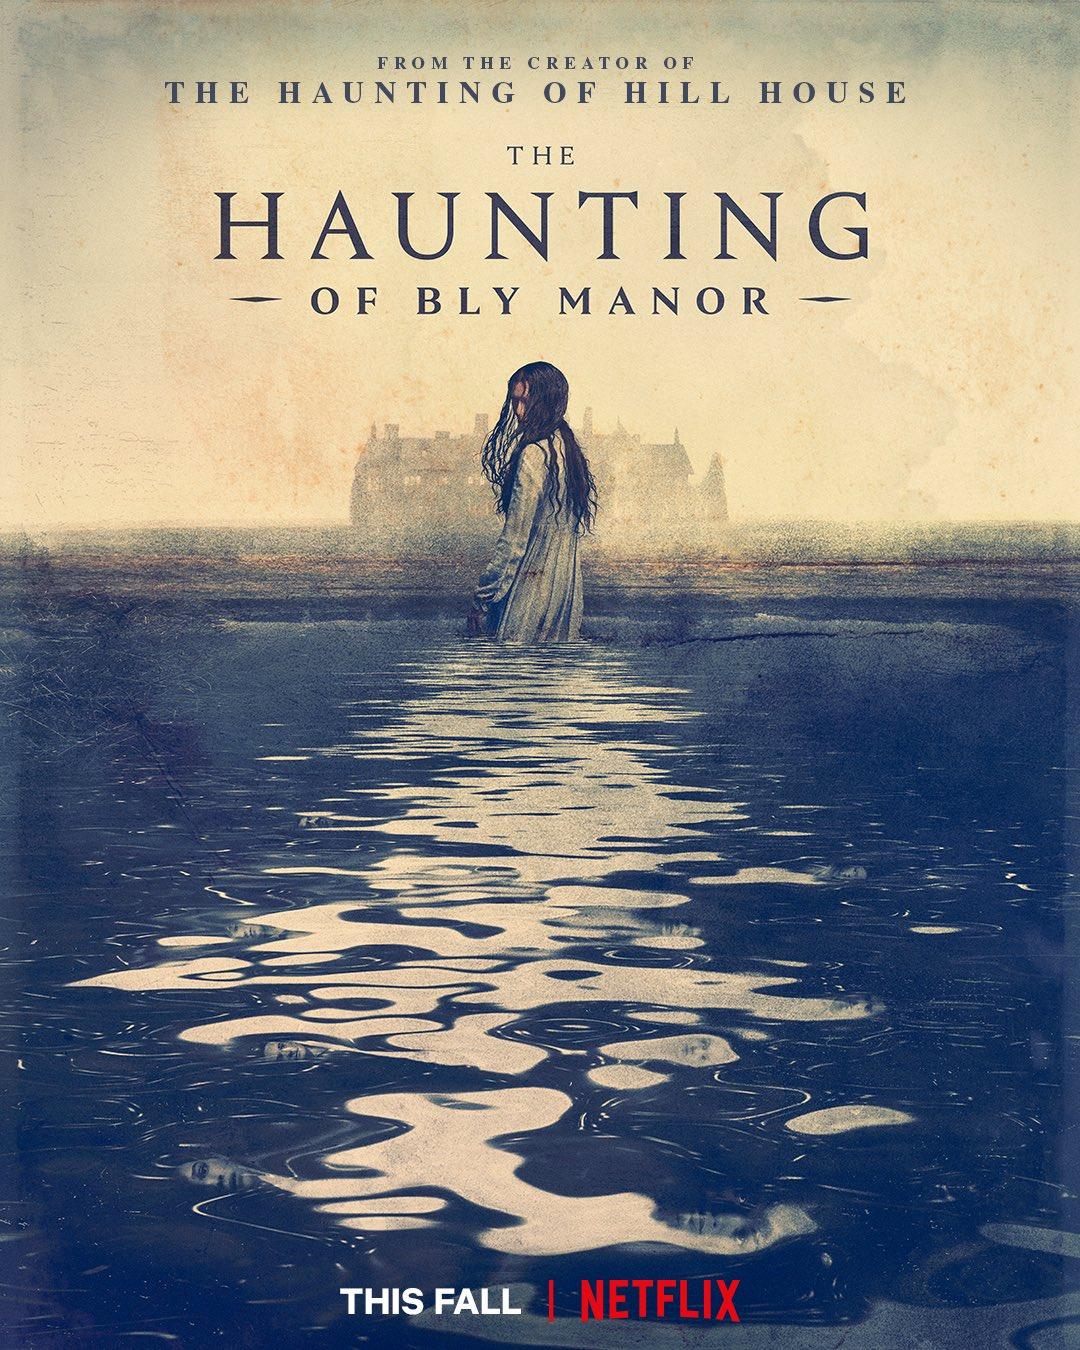 The Haunting of Bly Manor : Netflix dévoile les premières images